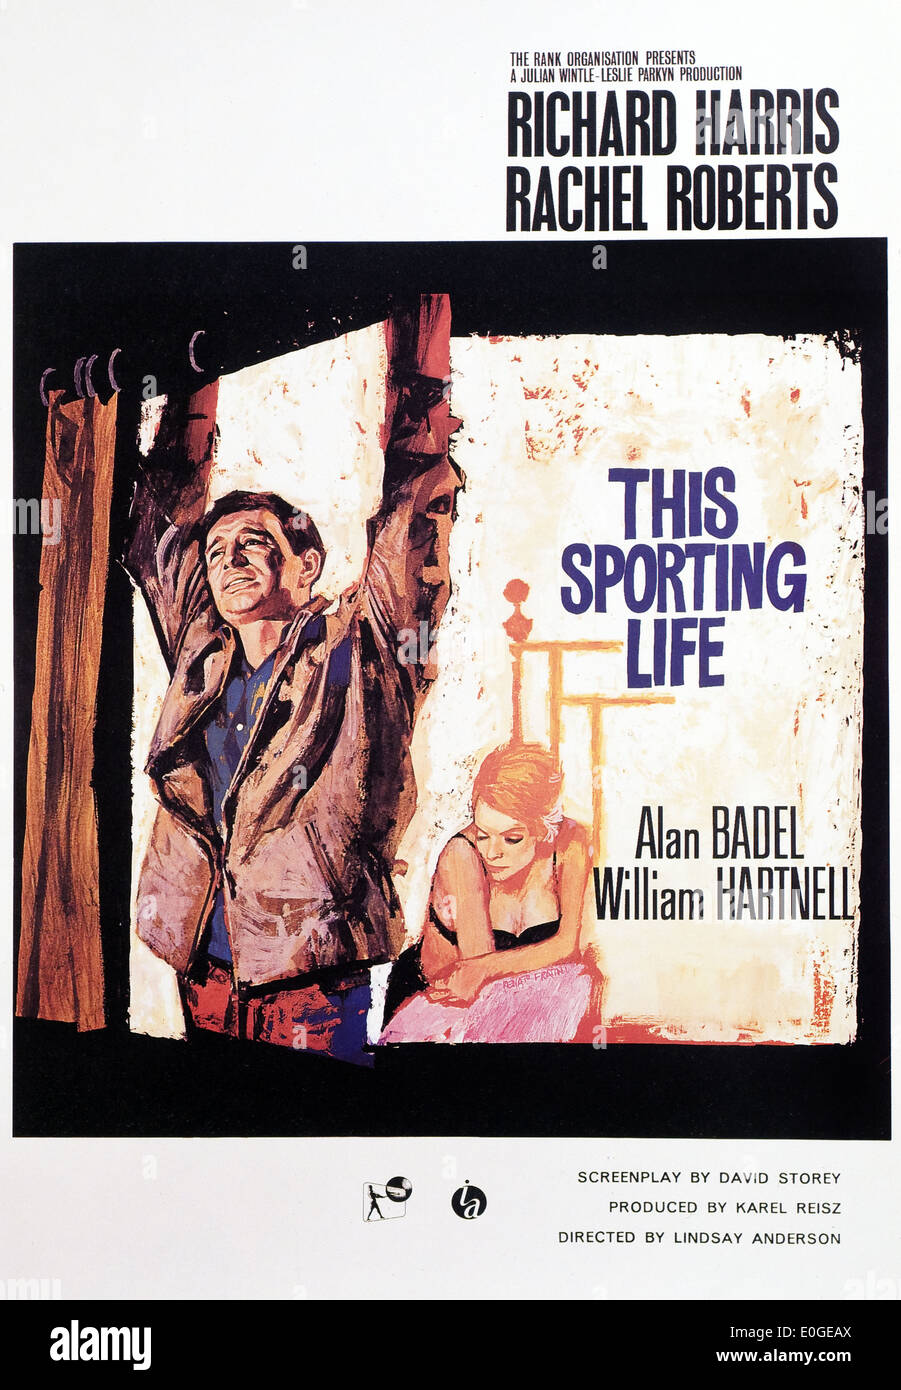 This Sporting Life - Original Movie Poster - Stock Image